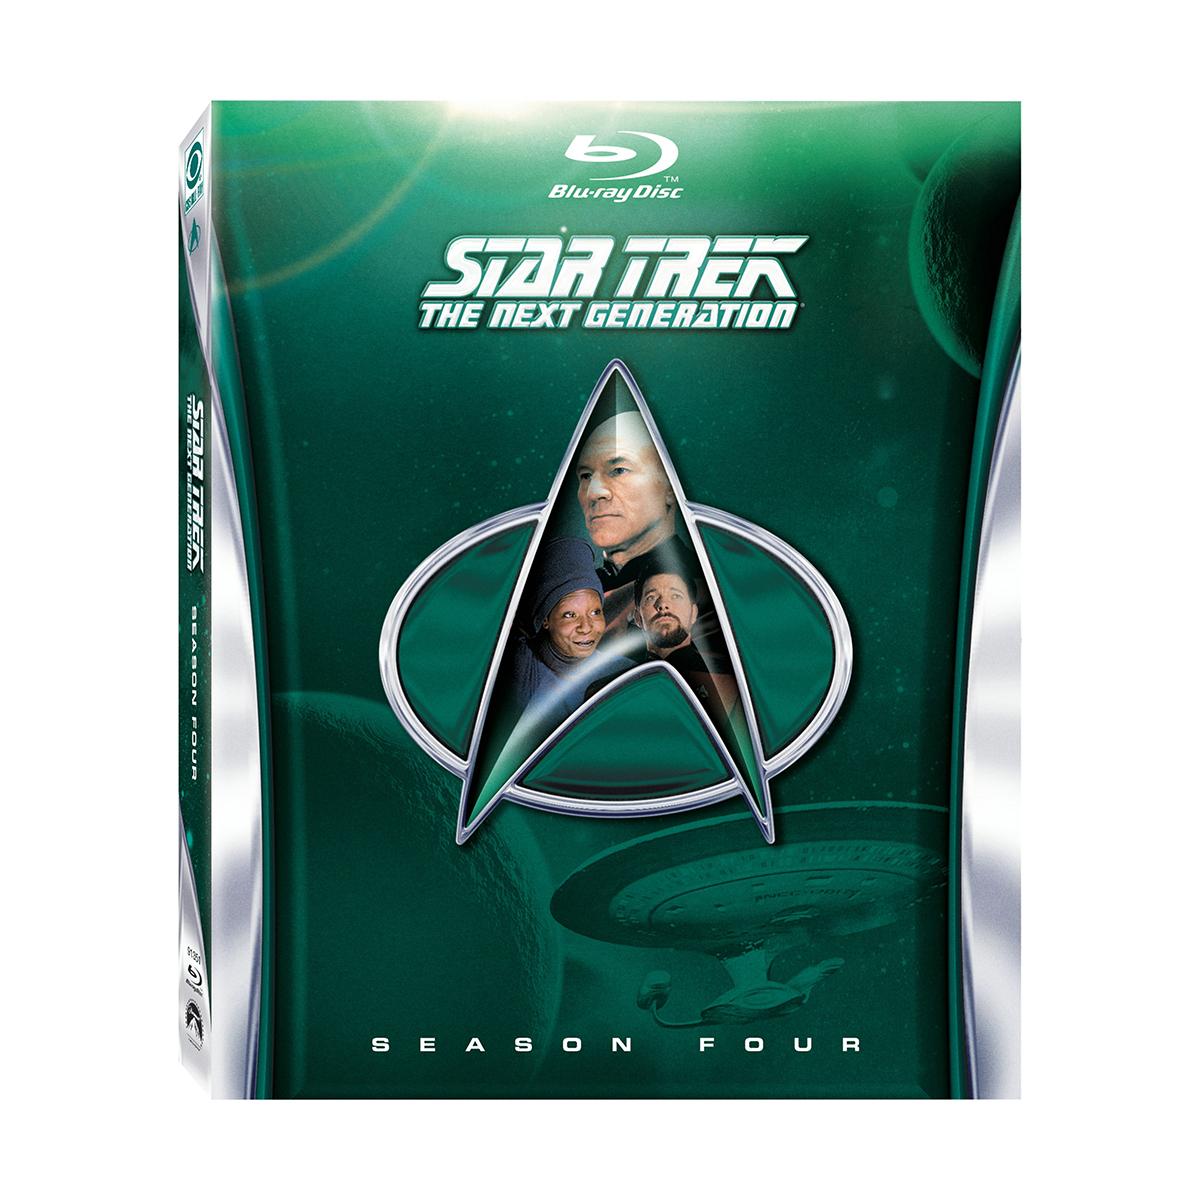 Star Trek: The Next Generation - Season 4 Blu-ray -  DVDs & Videos 2870-452625